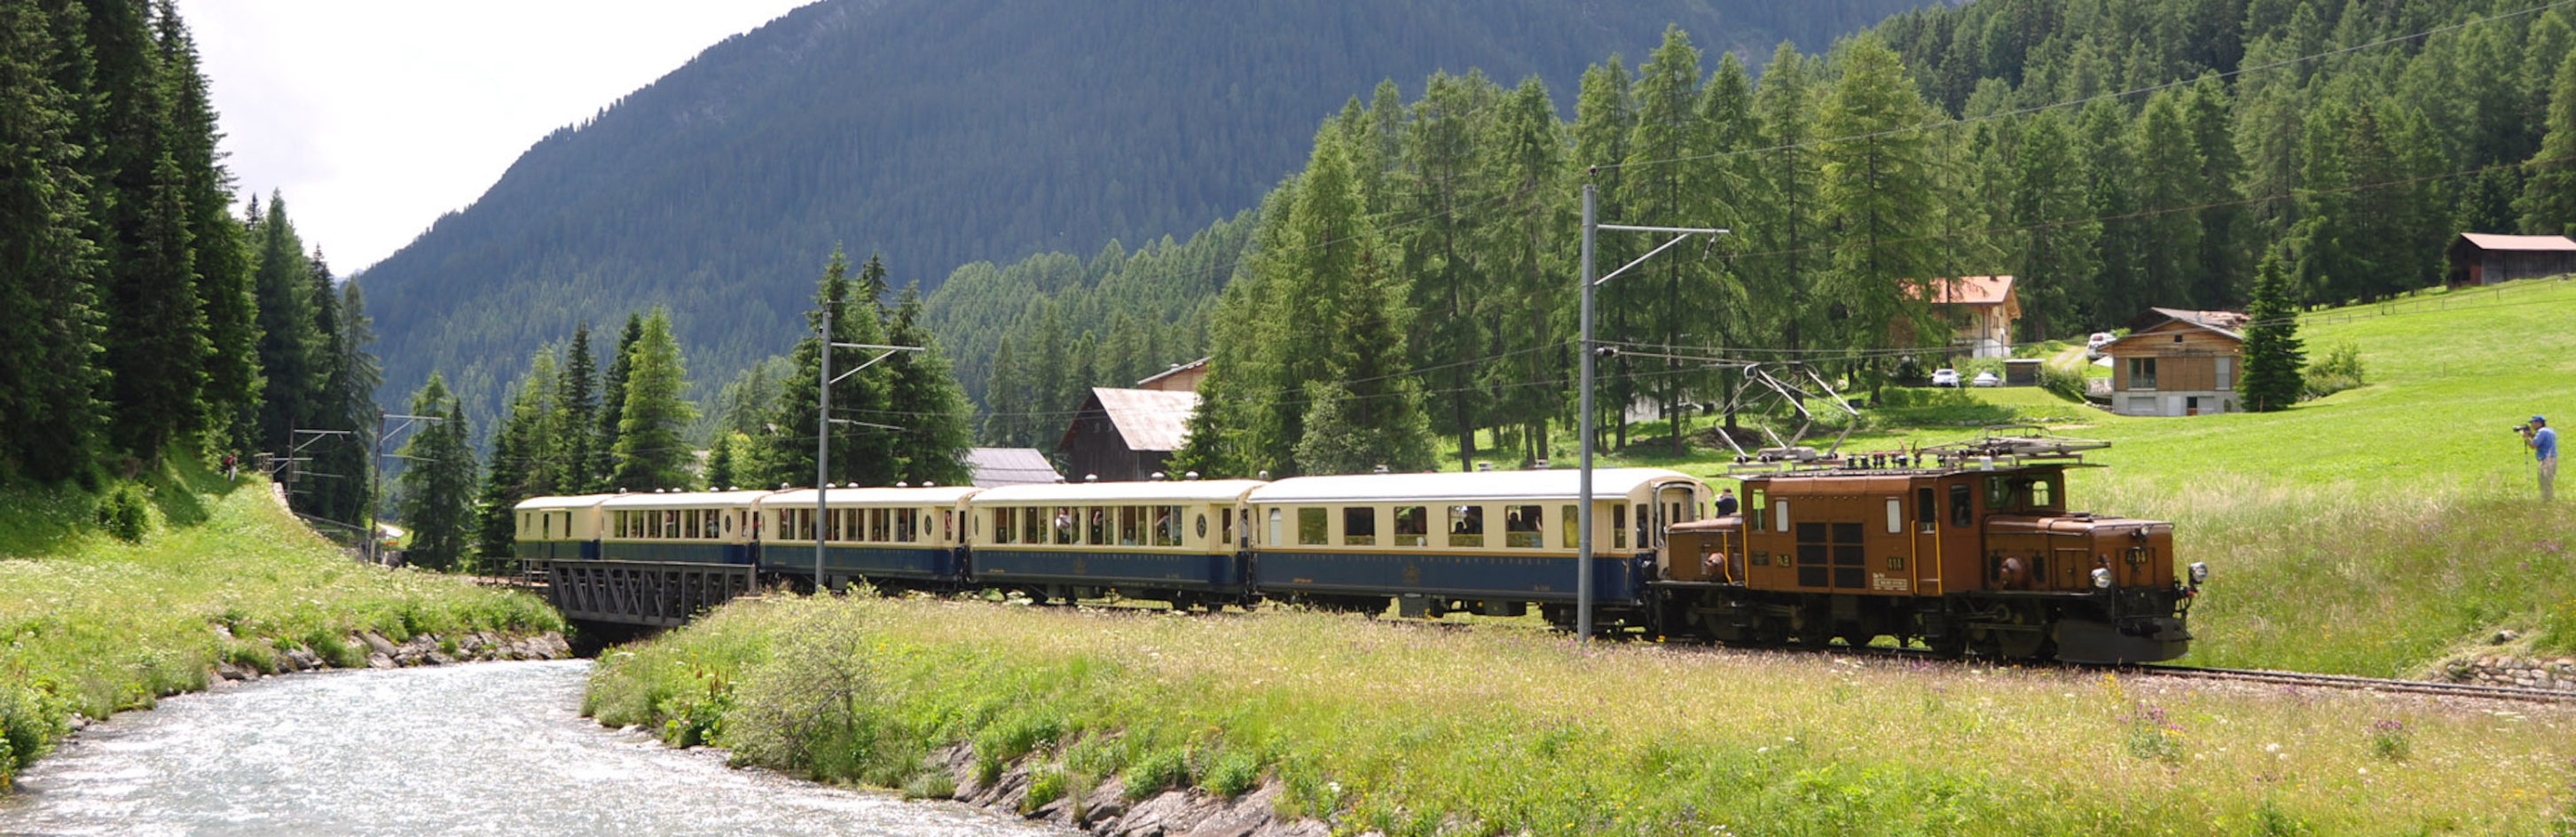 Swiss Rail Spectacular GE hero image